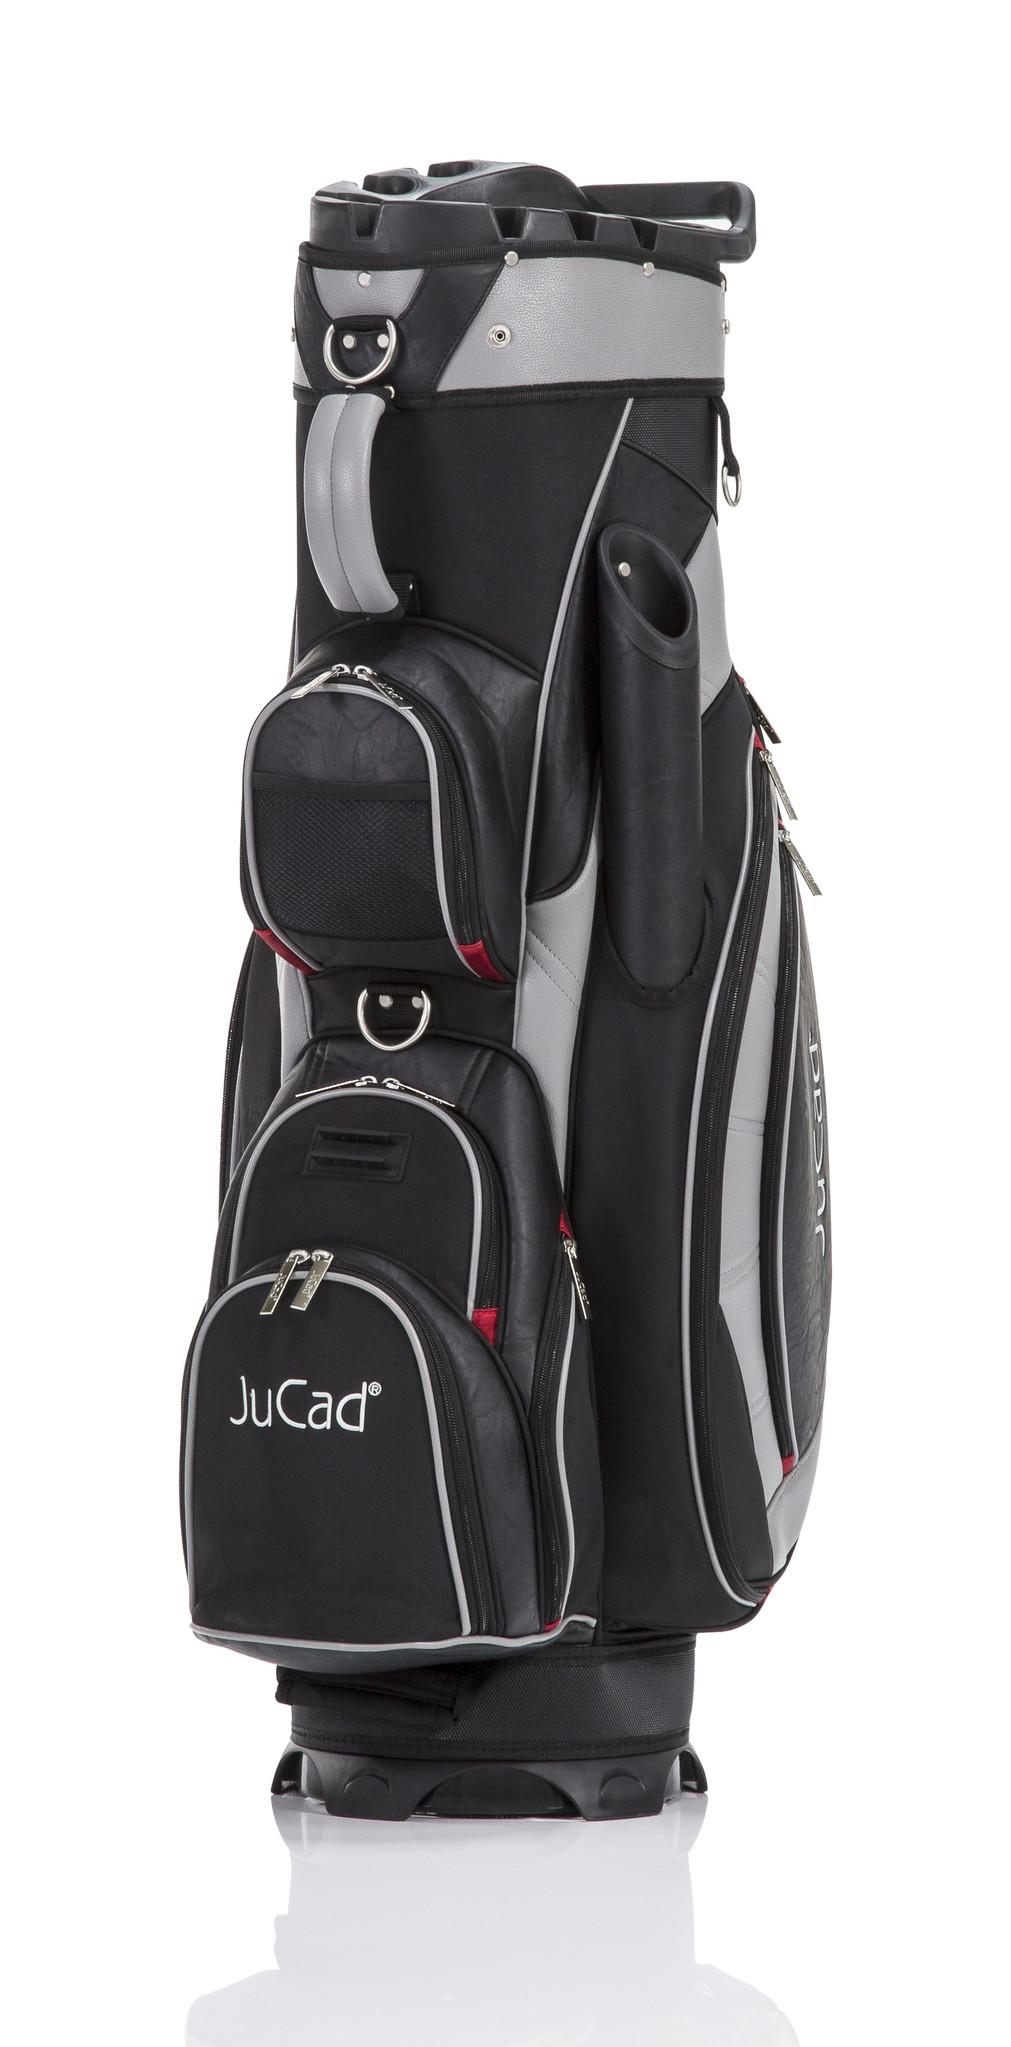 JuCad JuCad Manager (Zwart-Titanium)